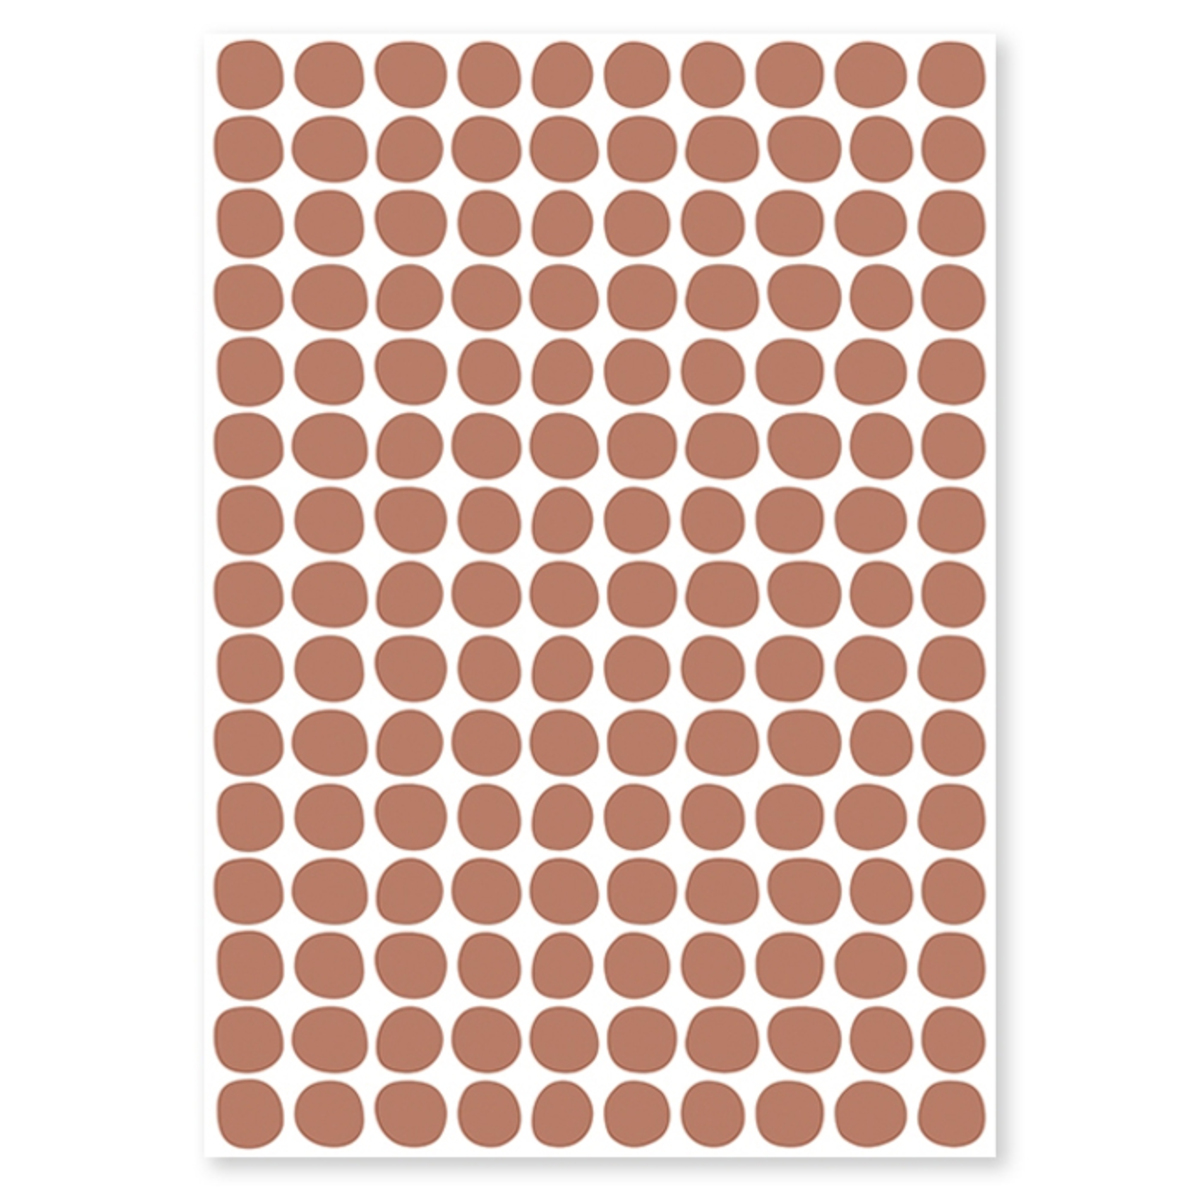 Sticker Planche de Stickers - Pois Terracotta Planche de Stickers - Pois Terracotta